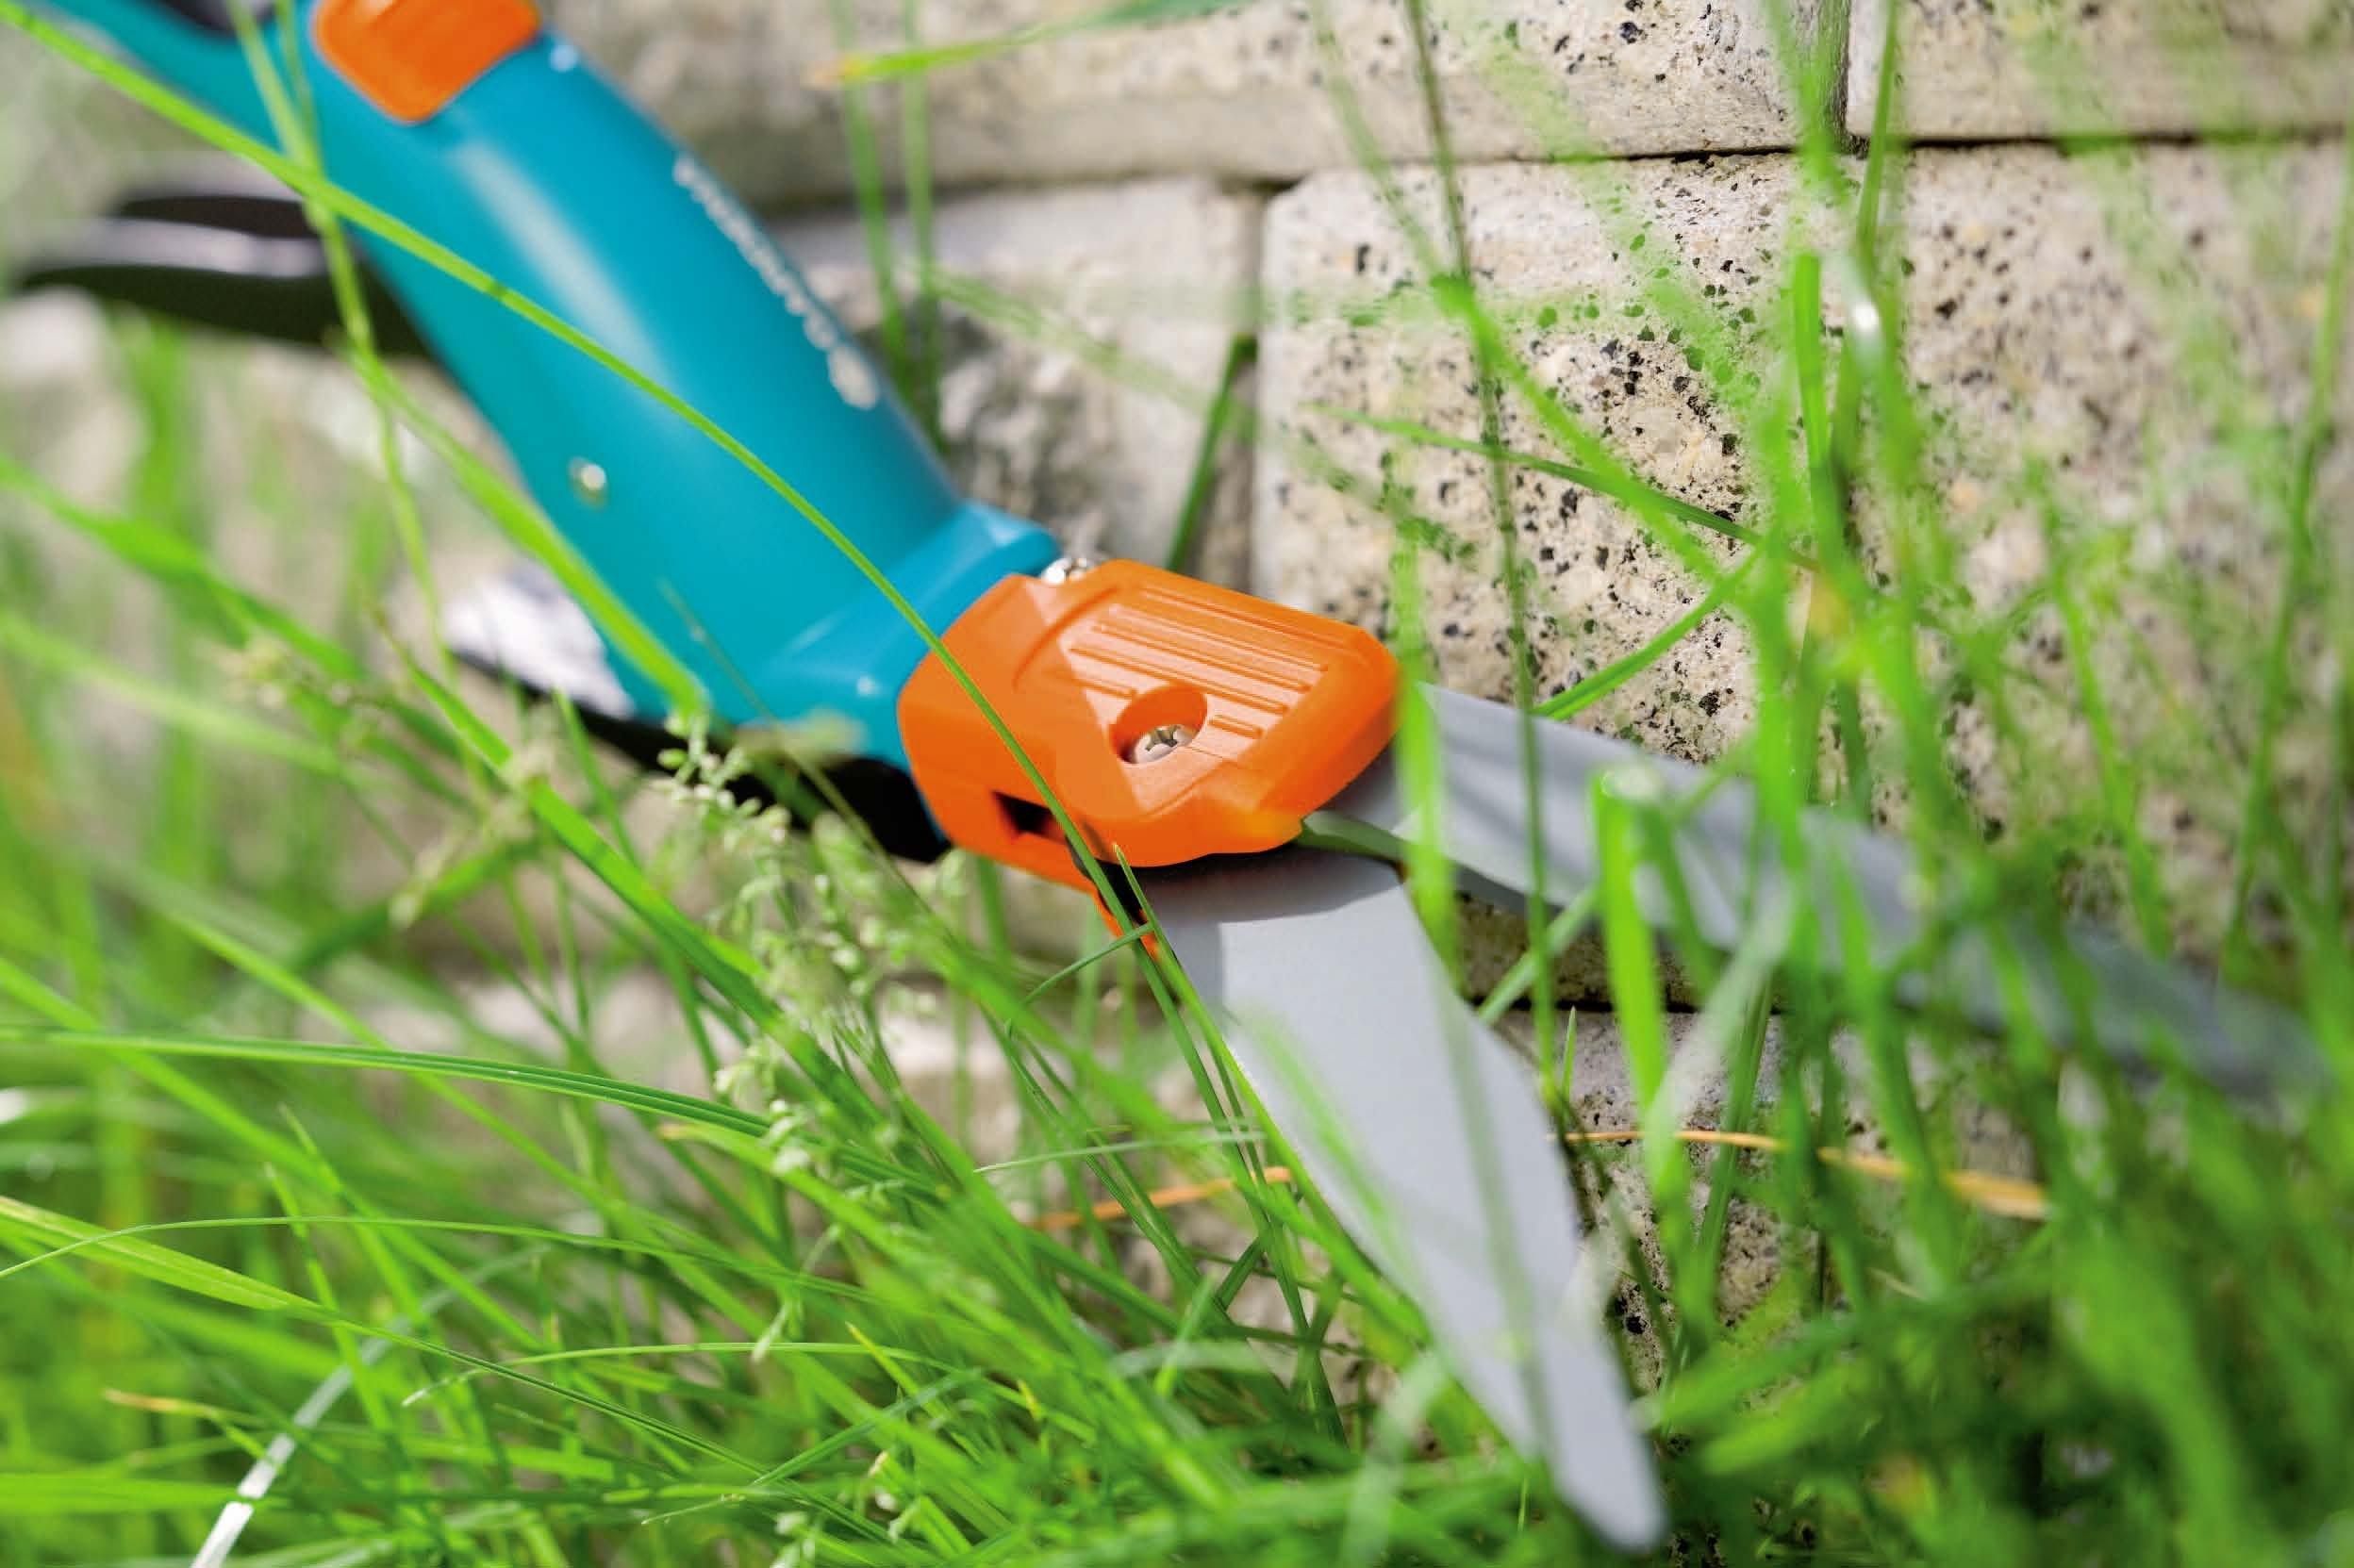 Gardena 8734 Comfort 27-Inch Swiveling Grass Shears